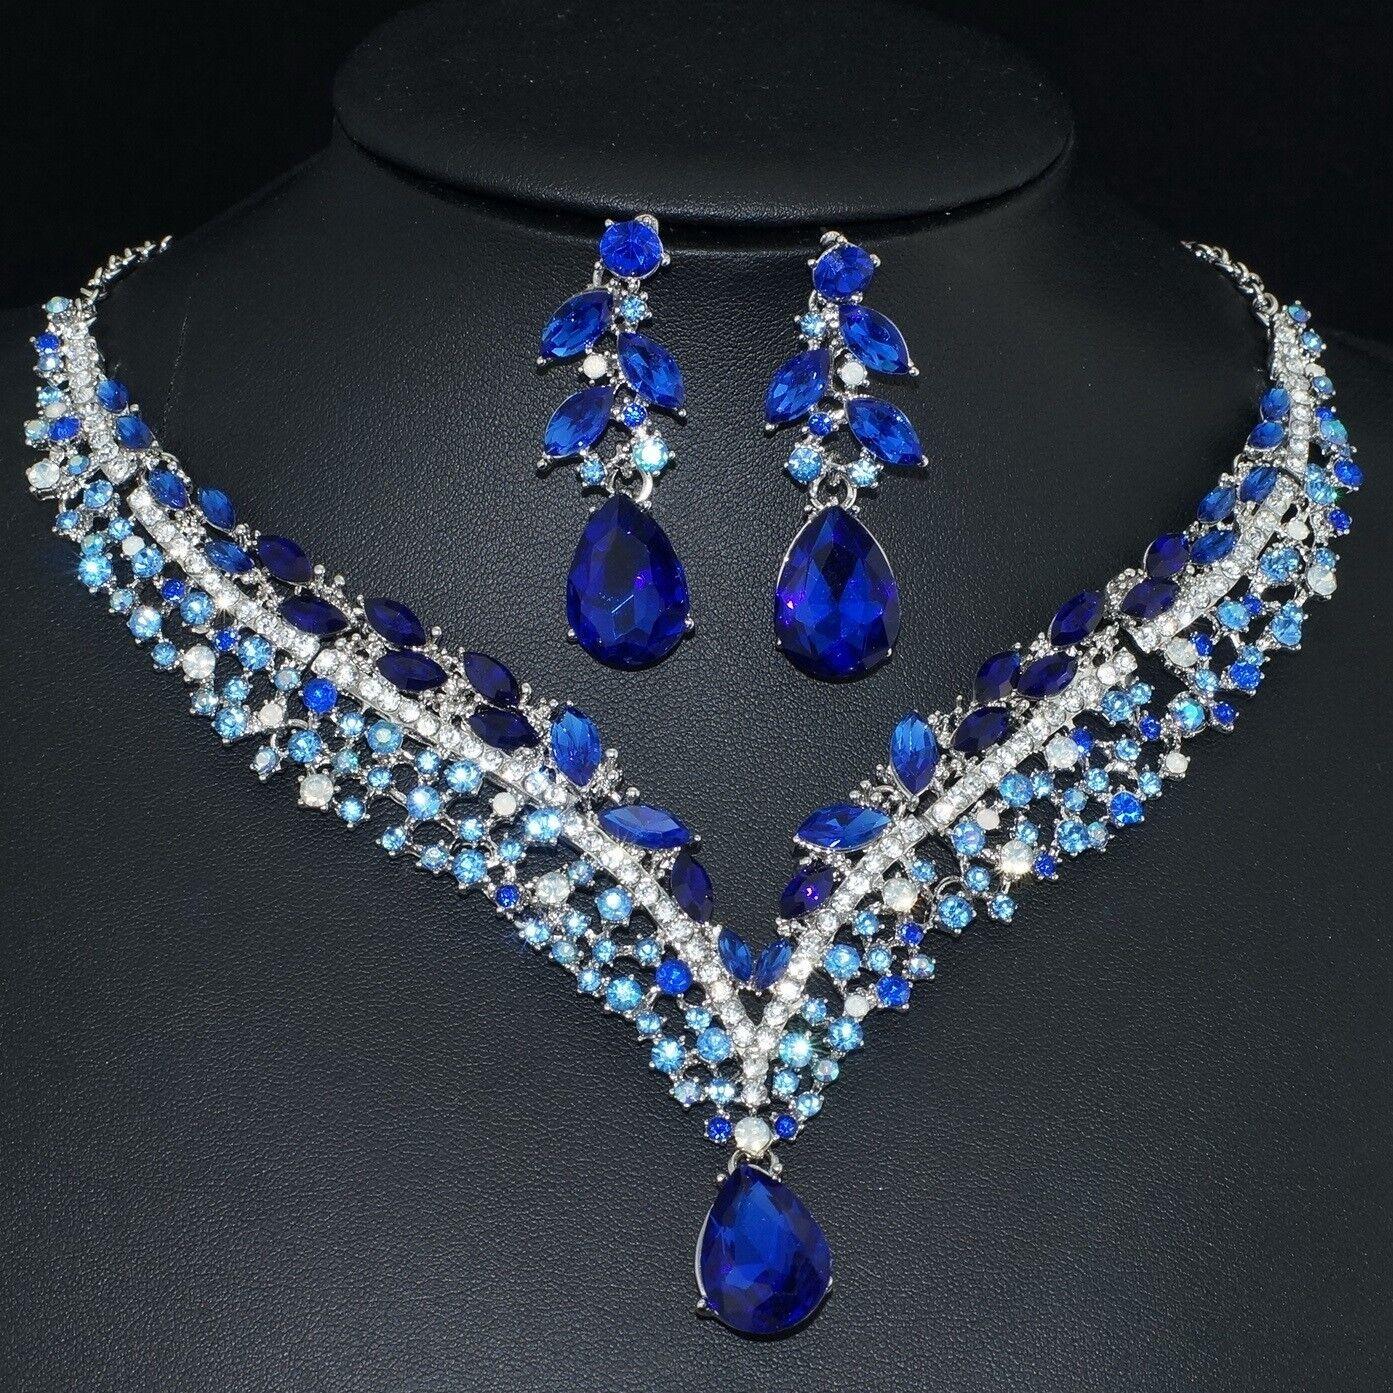 YT293 Blue Rhinestone Crystal Earrings Necklace Set Bridal